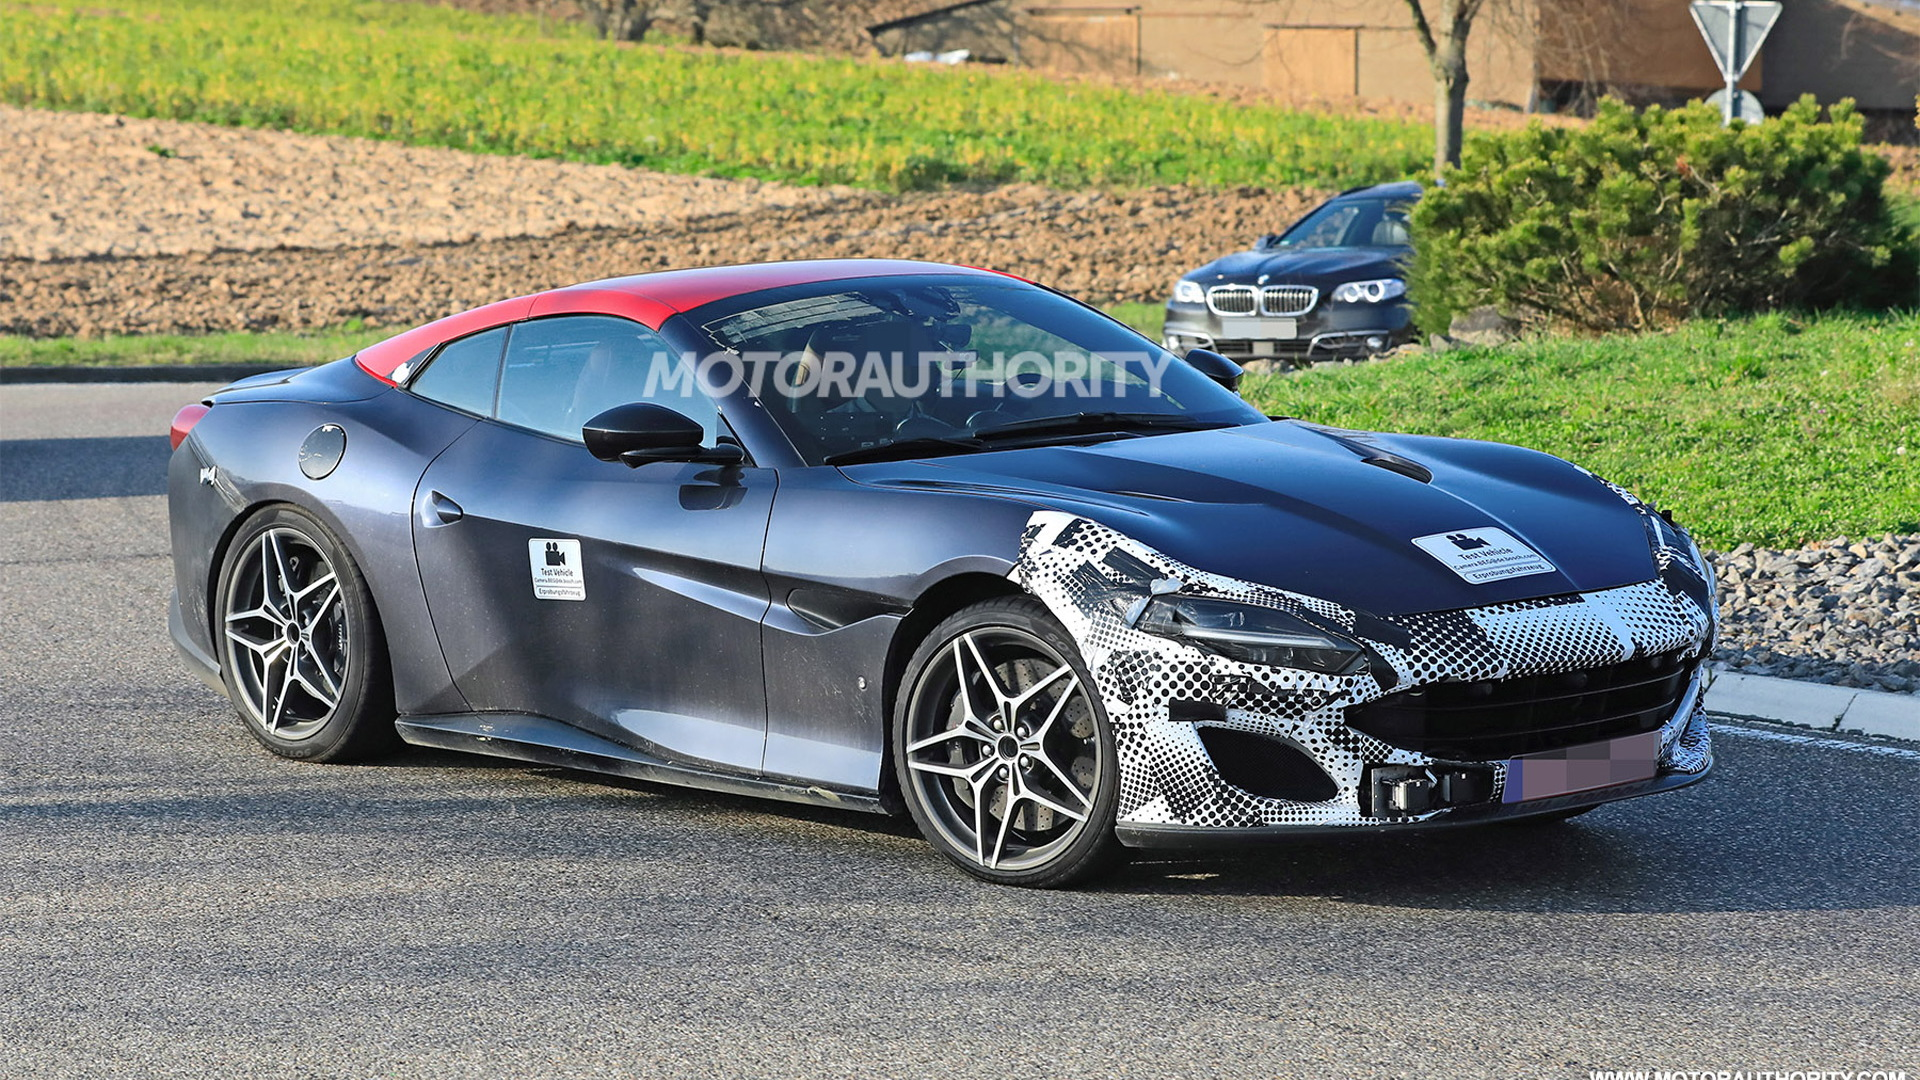 2021 Ferrari Portofino facelift spy shots - Photo credit: S. Baldauf/SB-Medien